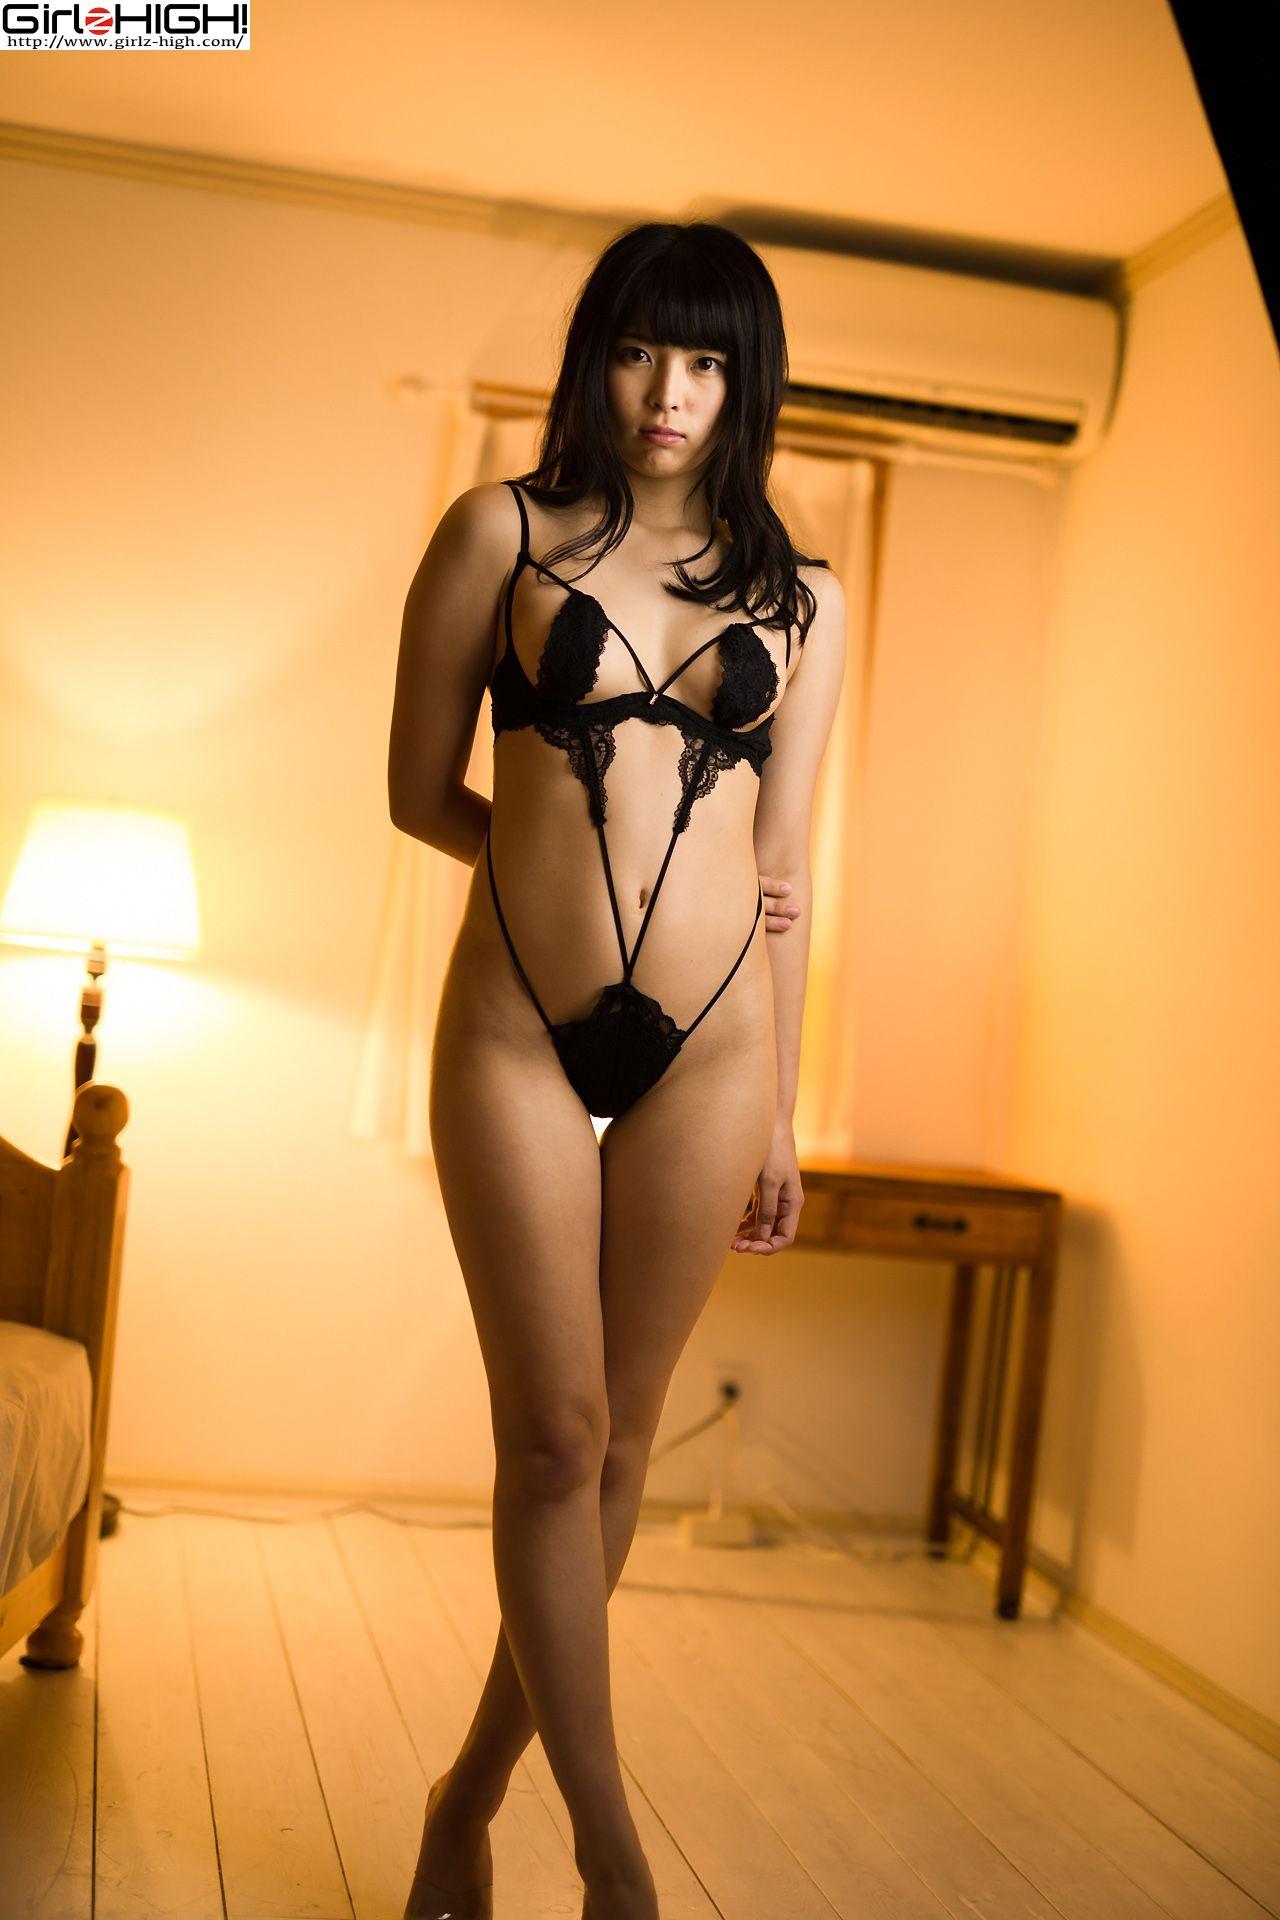 VOL.274 [Girlz-High]丁字裤人体艺术情趣内衣:望月みはる超高清写真套图(45P)